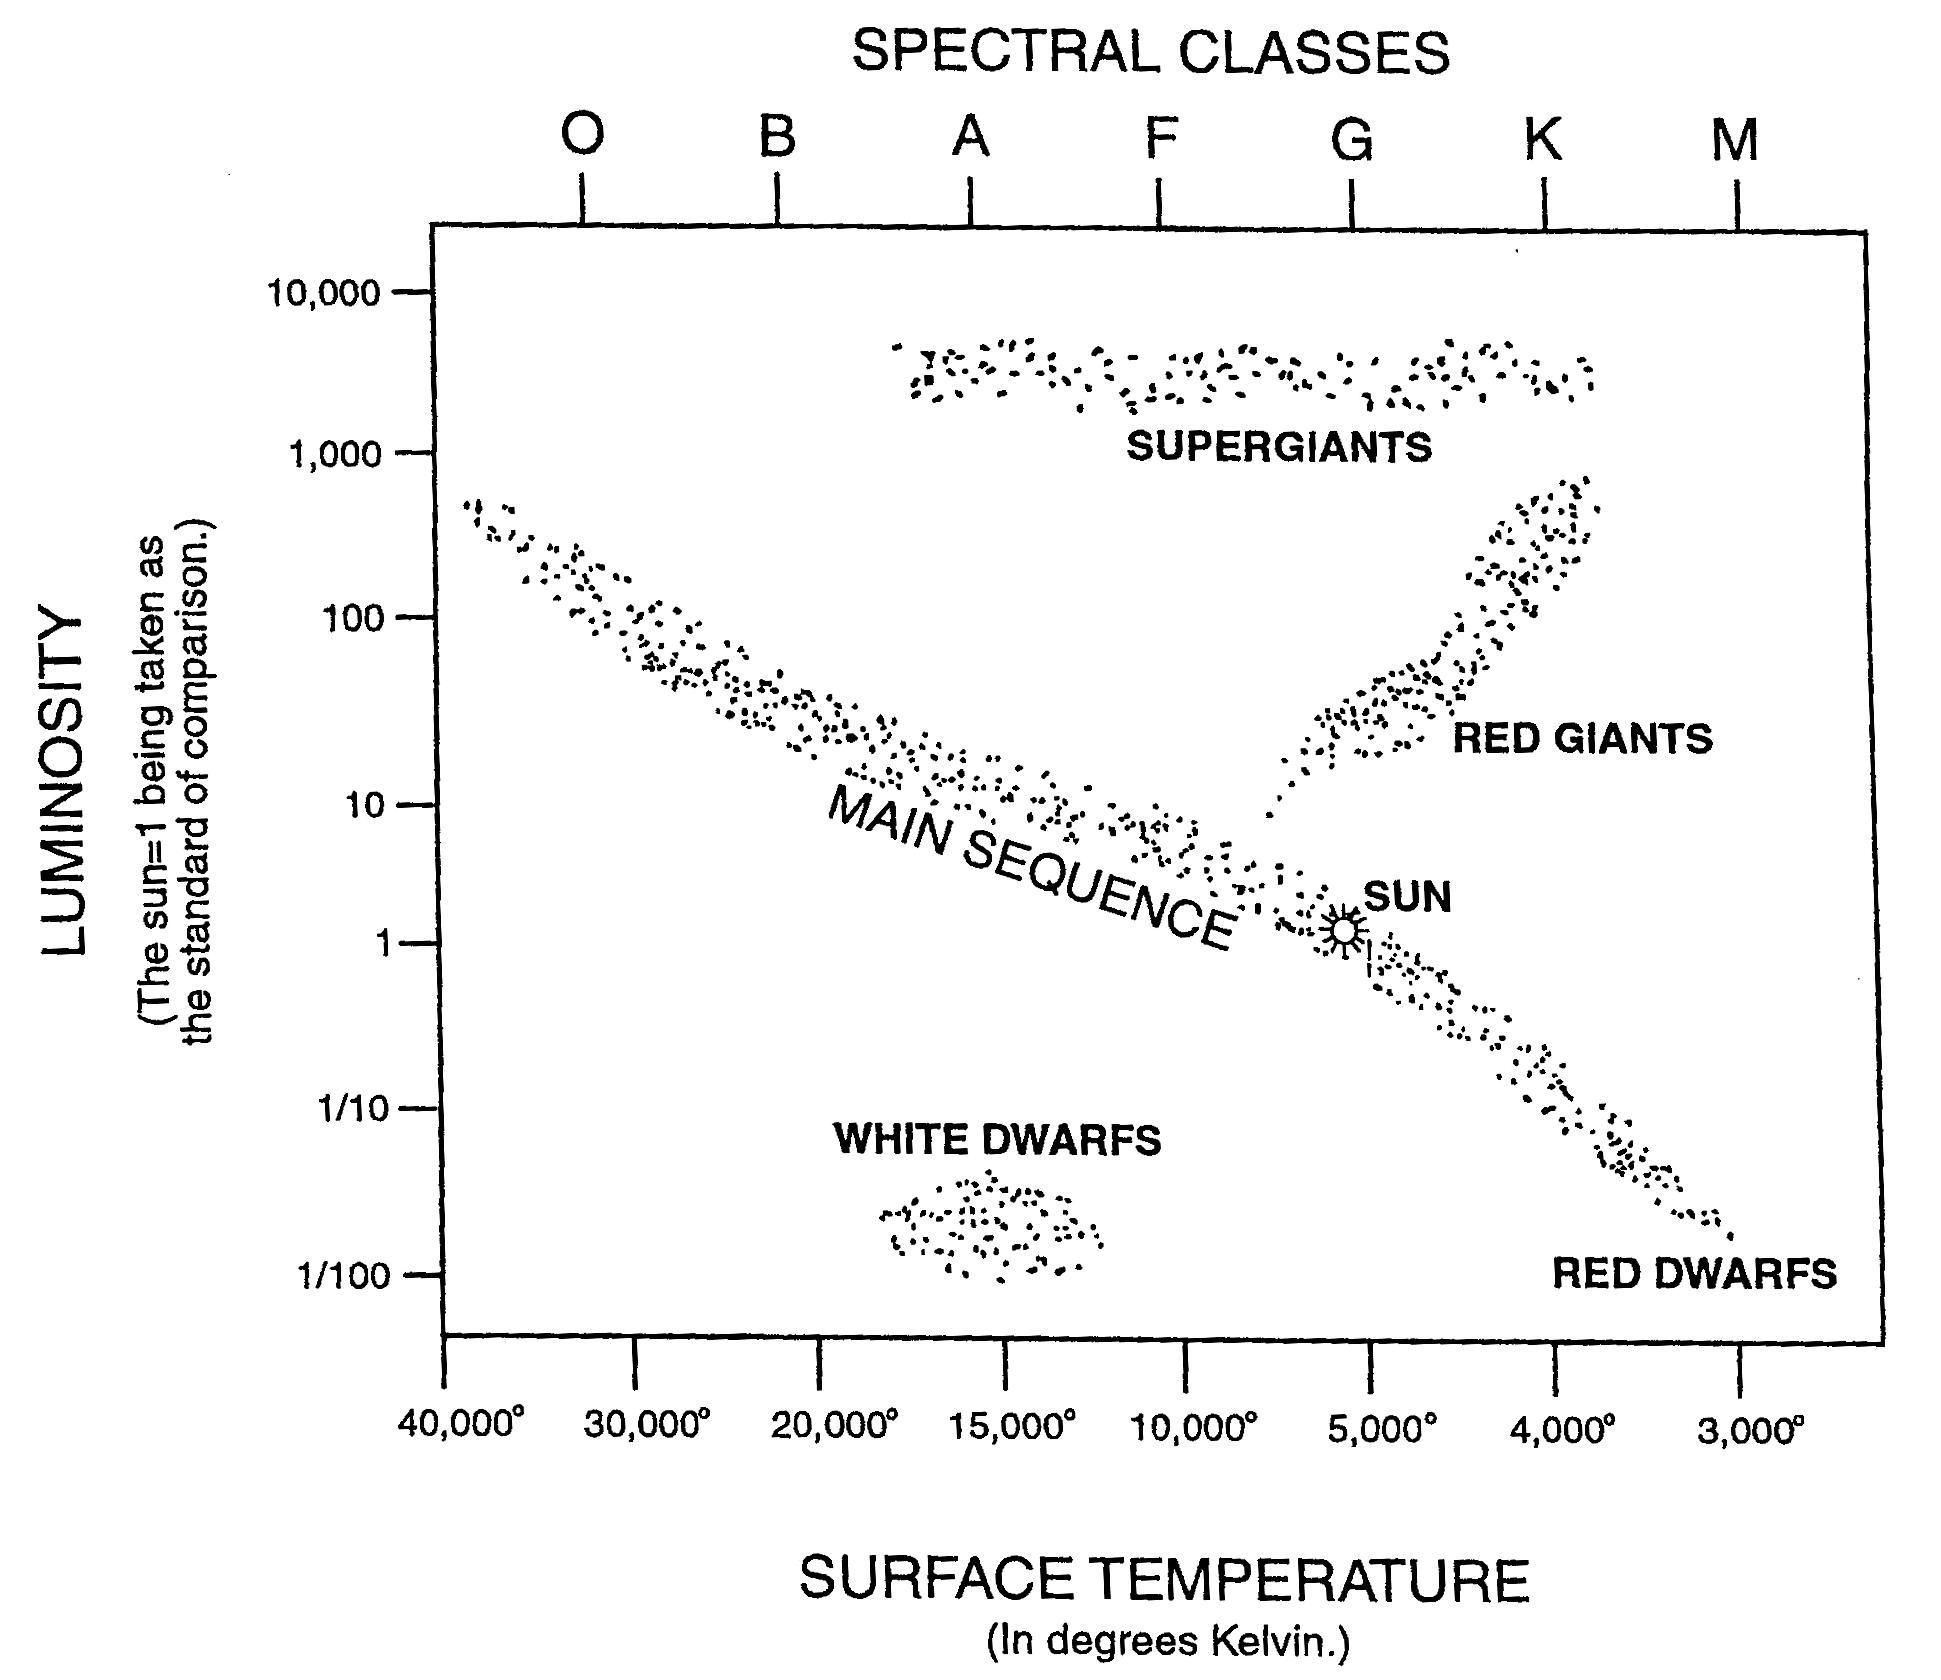 simple hr diagram google search teaching diagram simple teaching hr diagram sketch [ 1941 x 1680 Pixel ]